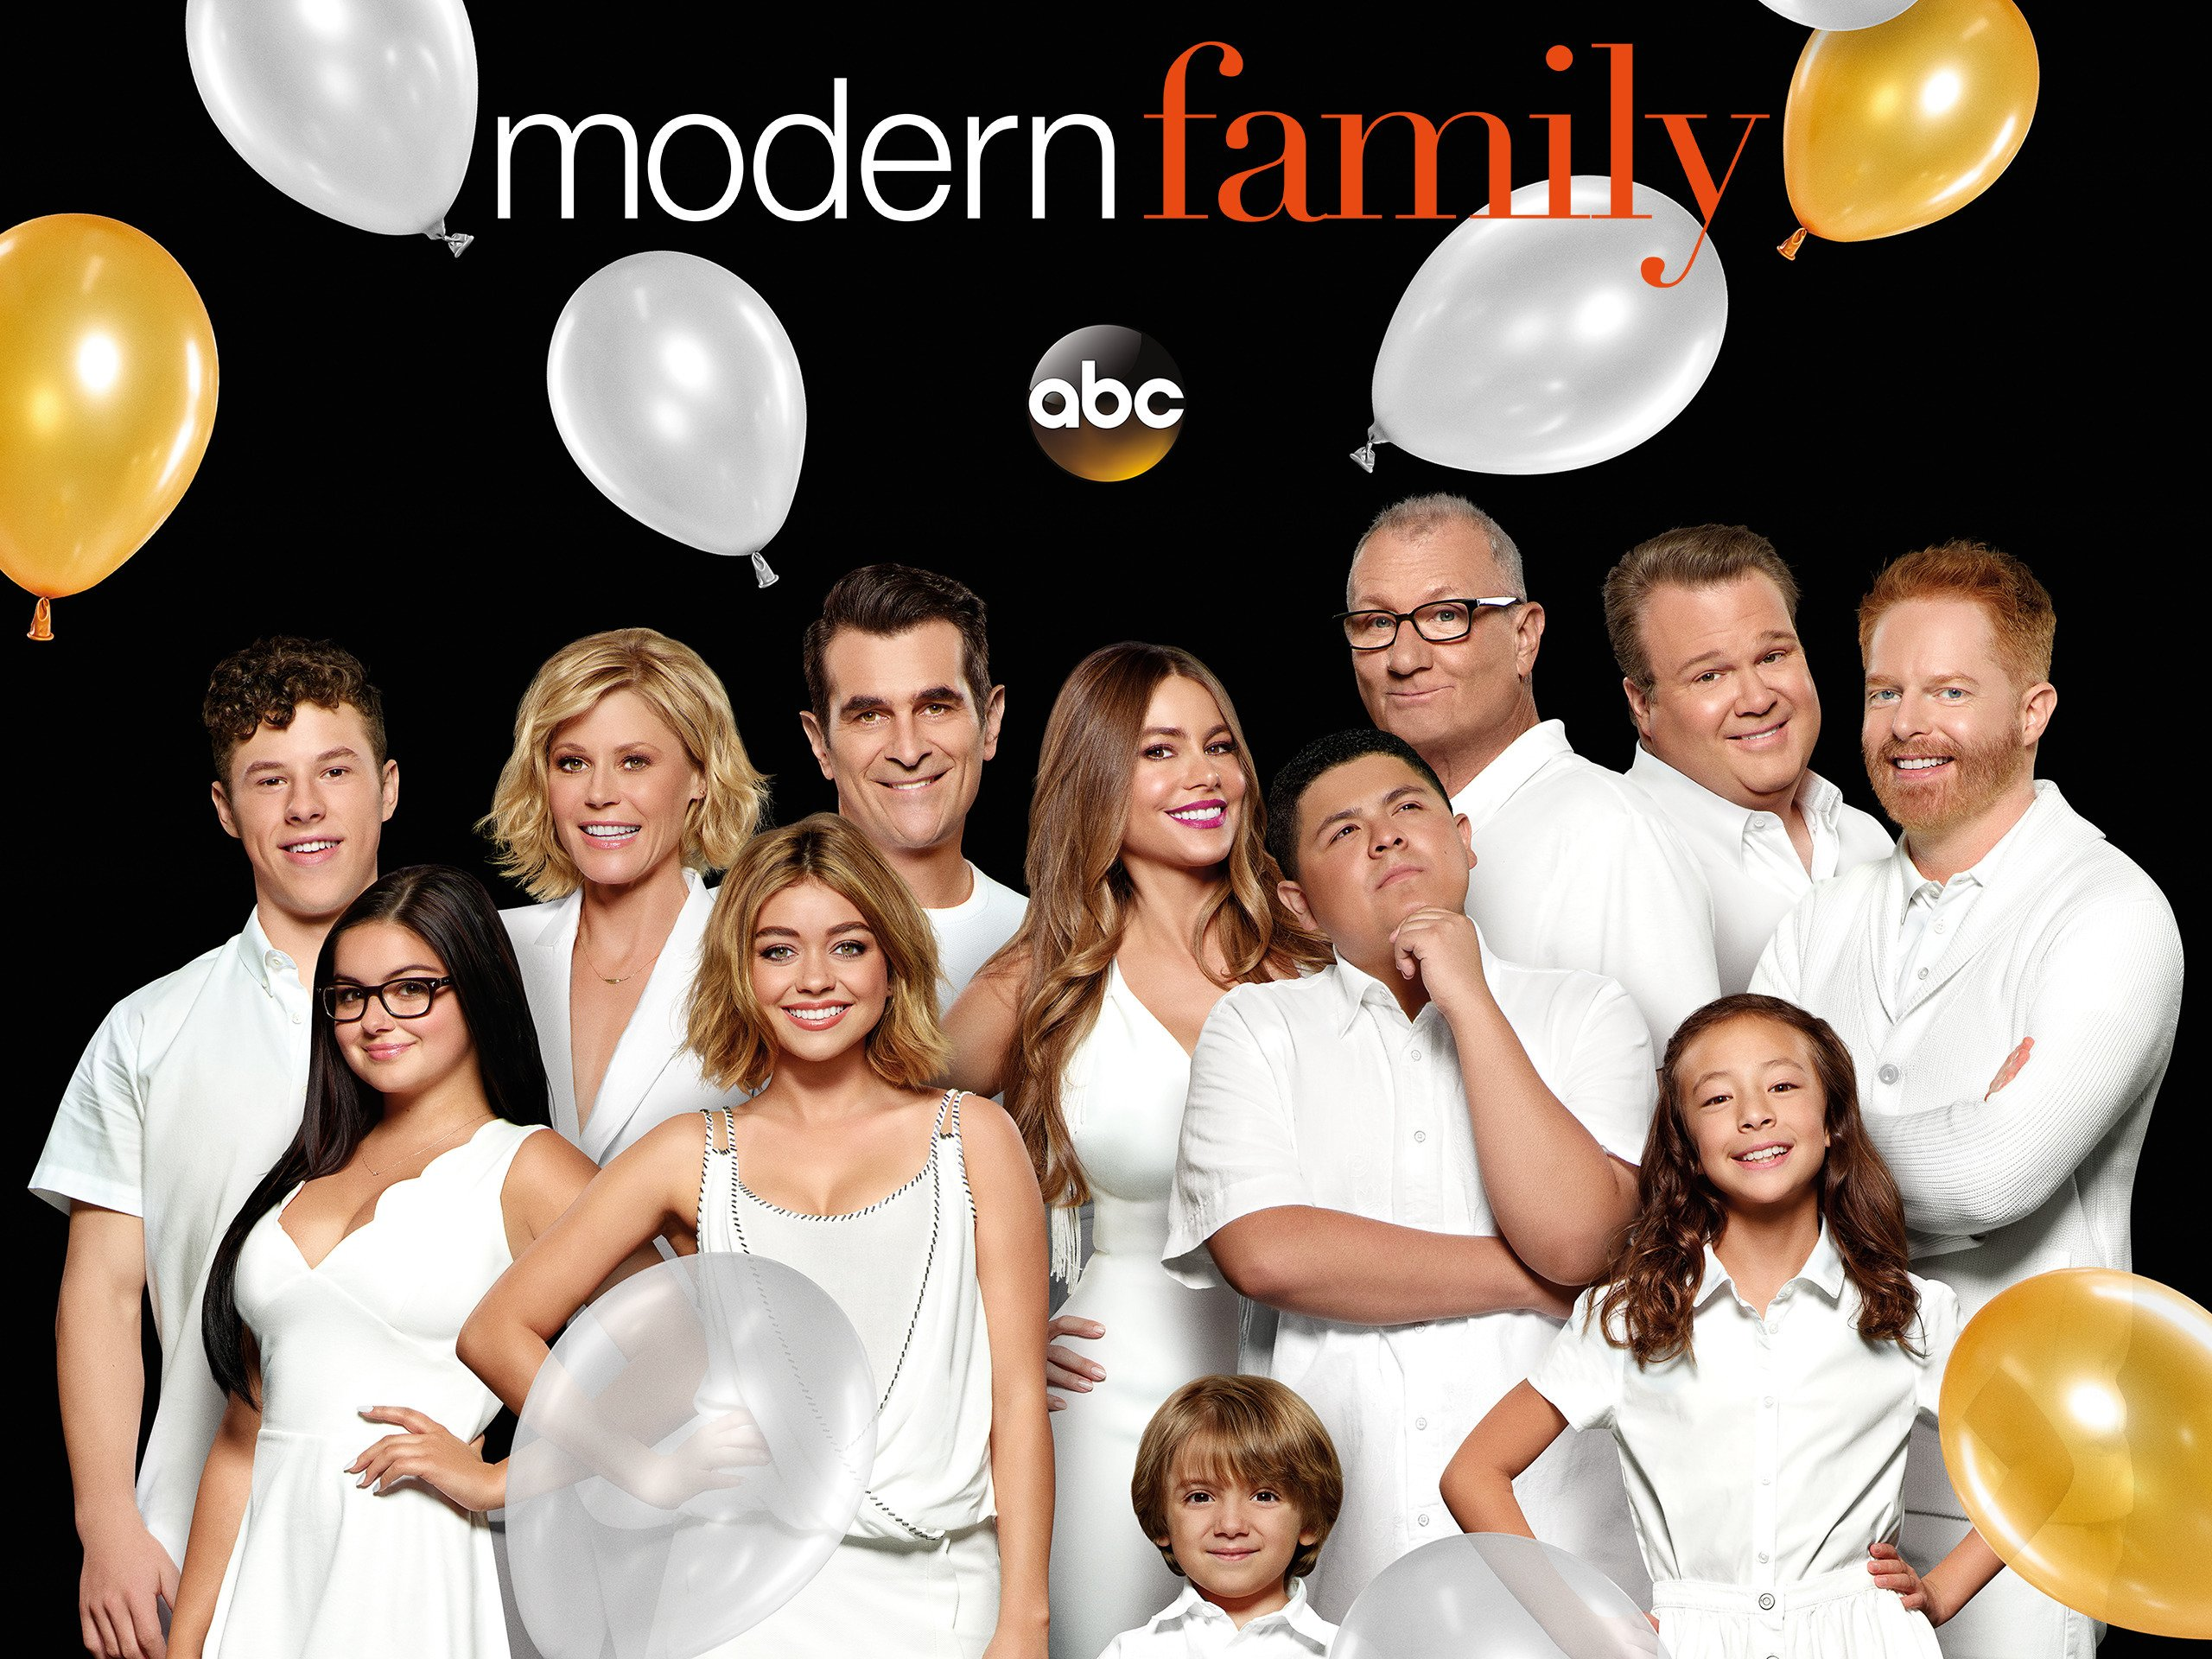 download modern family season 10 subtitles